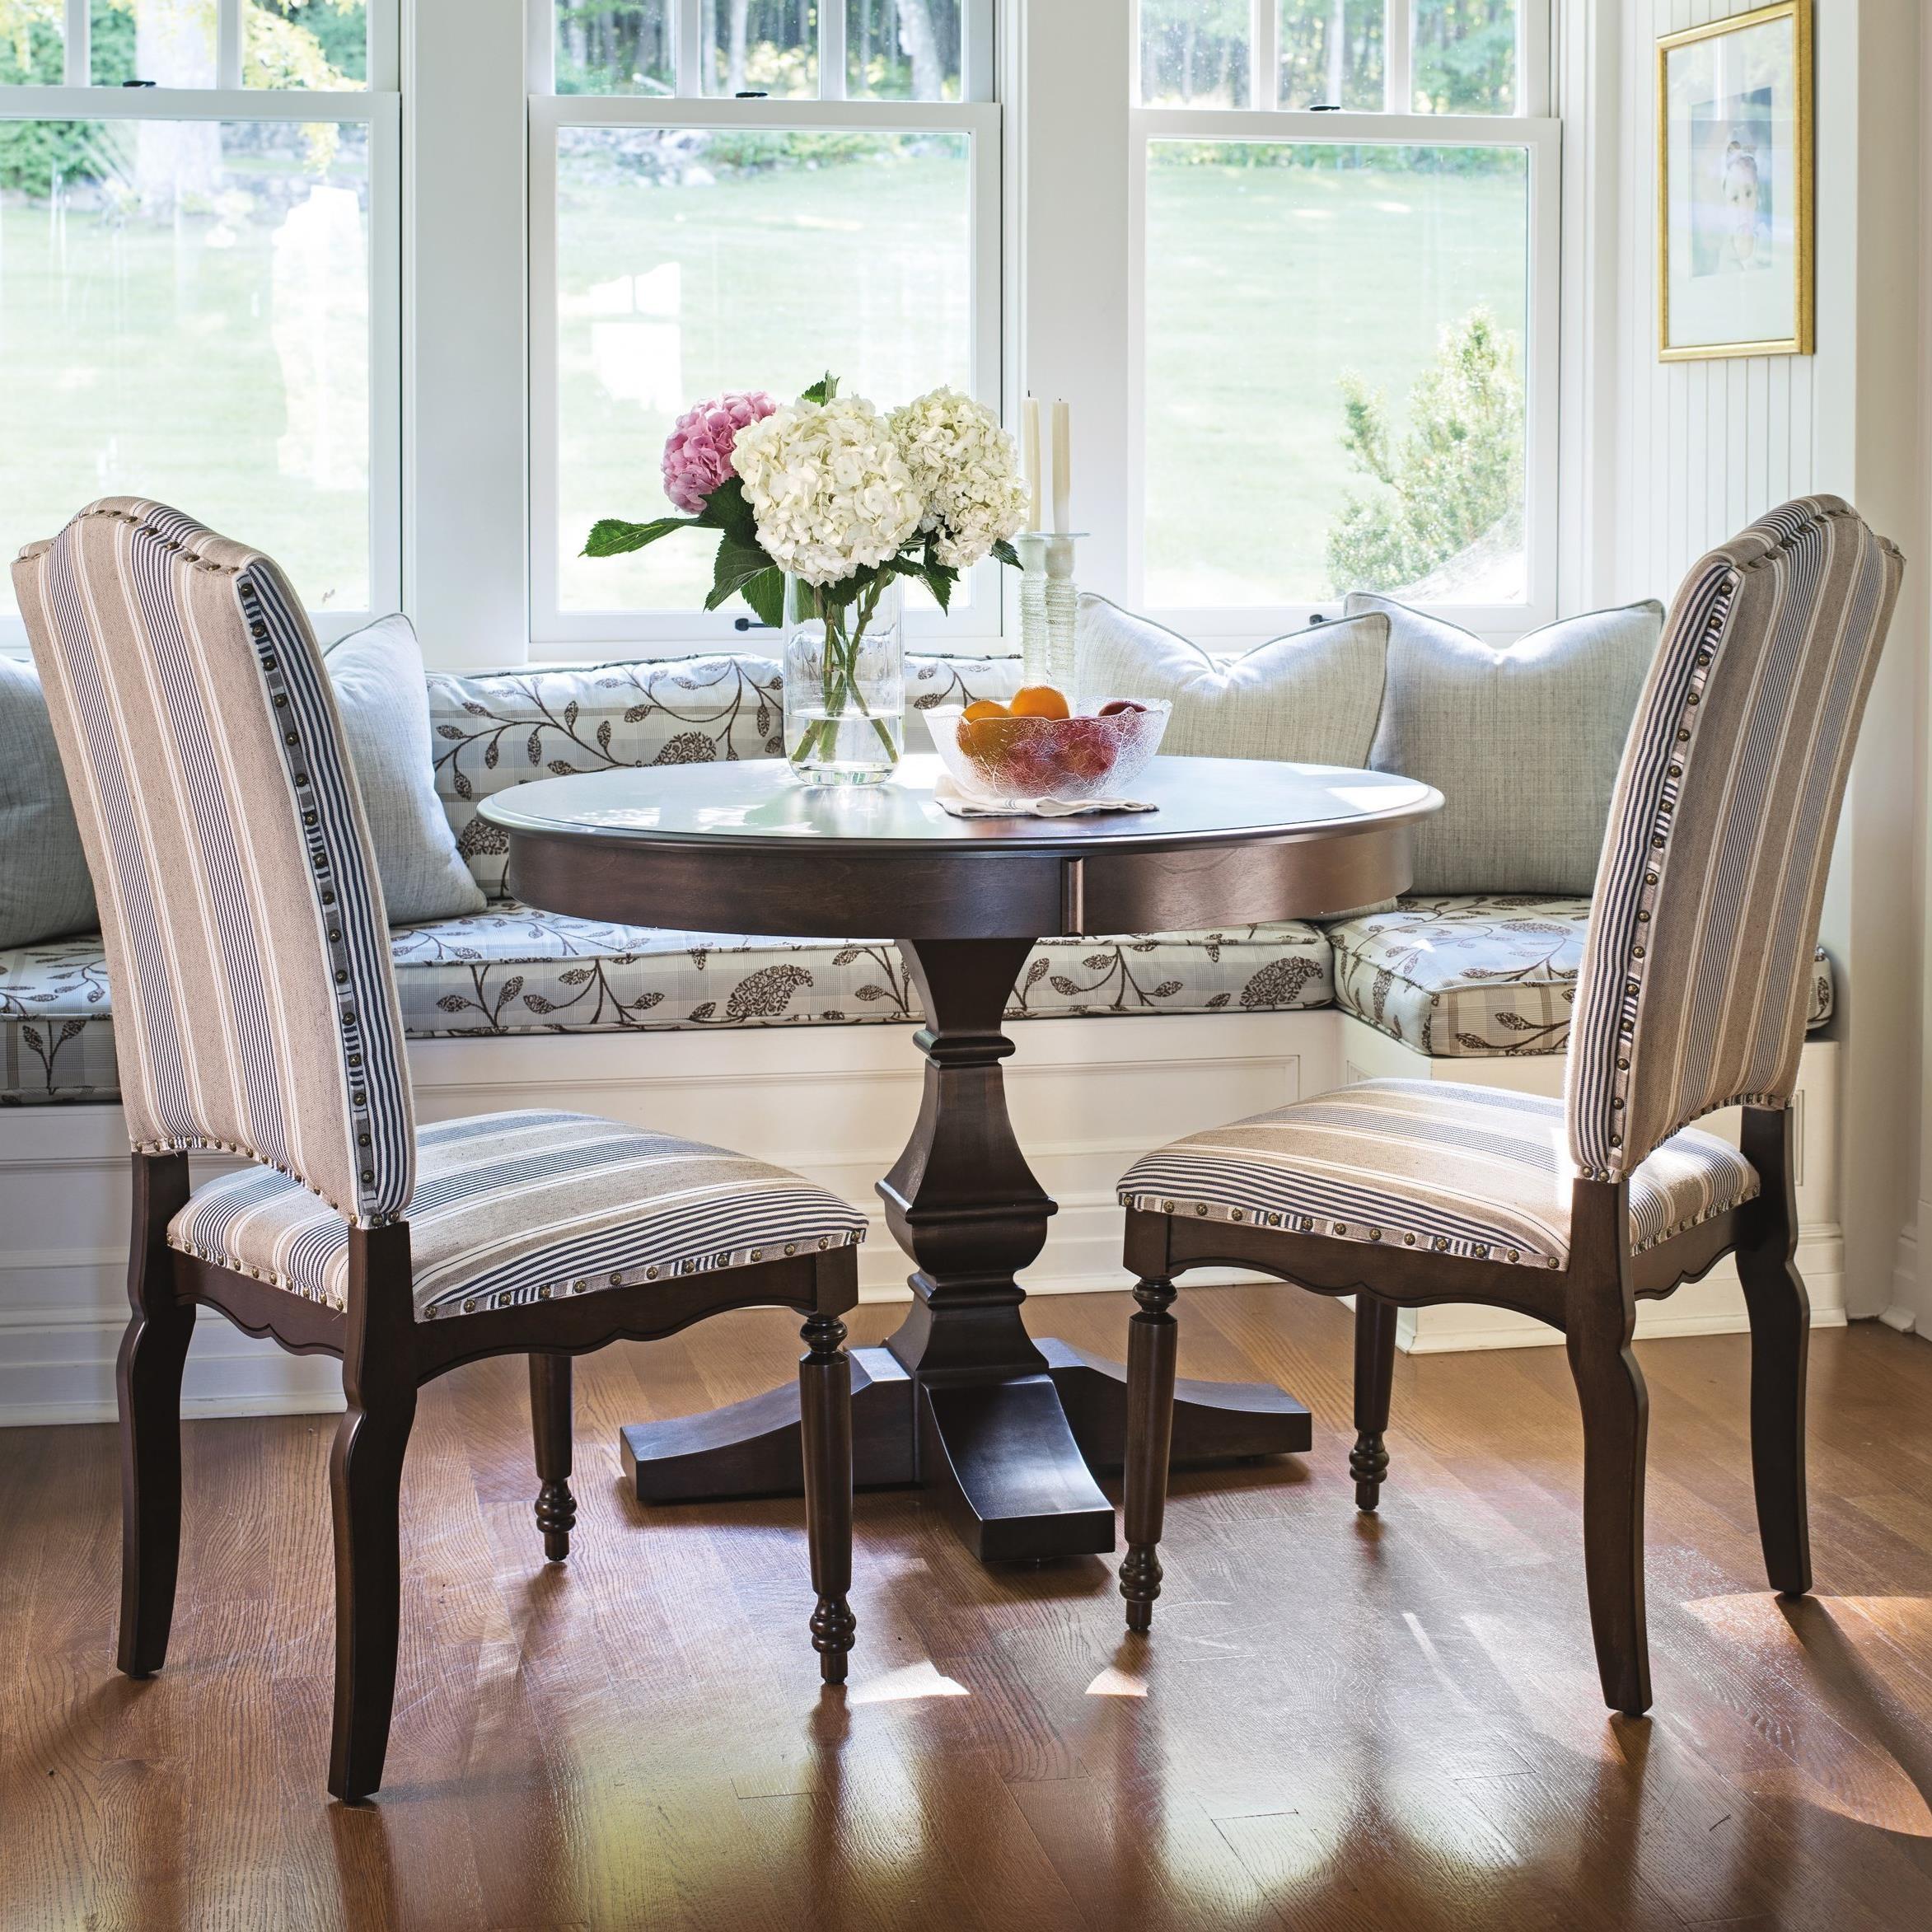 canadel custom dining customizable round dining table set darvin rh darvin com custom dining room seat cushions Dining Room Built Ins